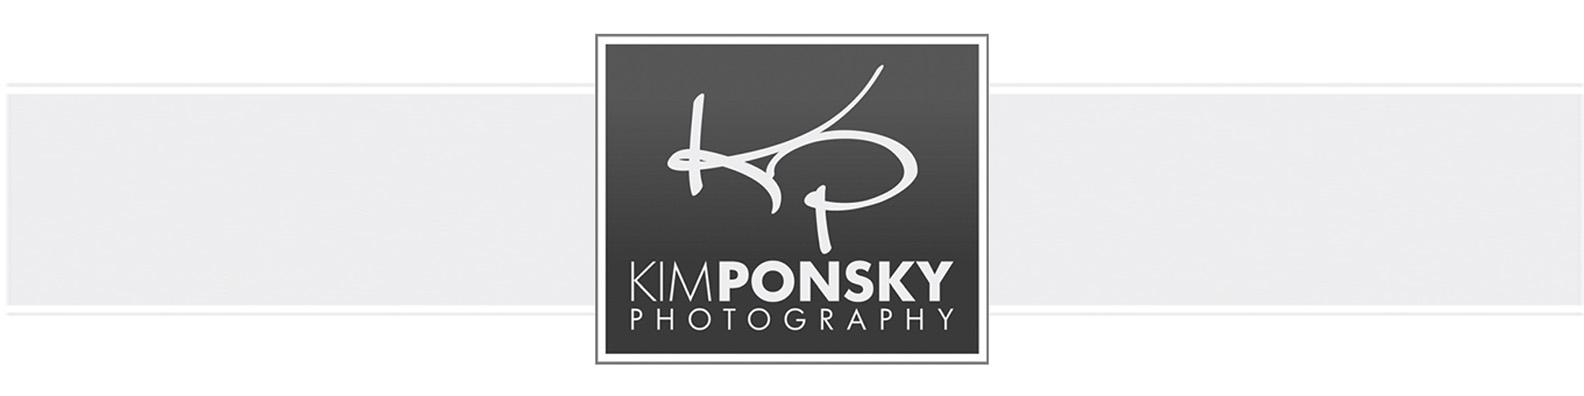 Kim Ponsky Photography